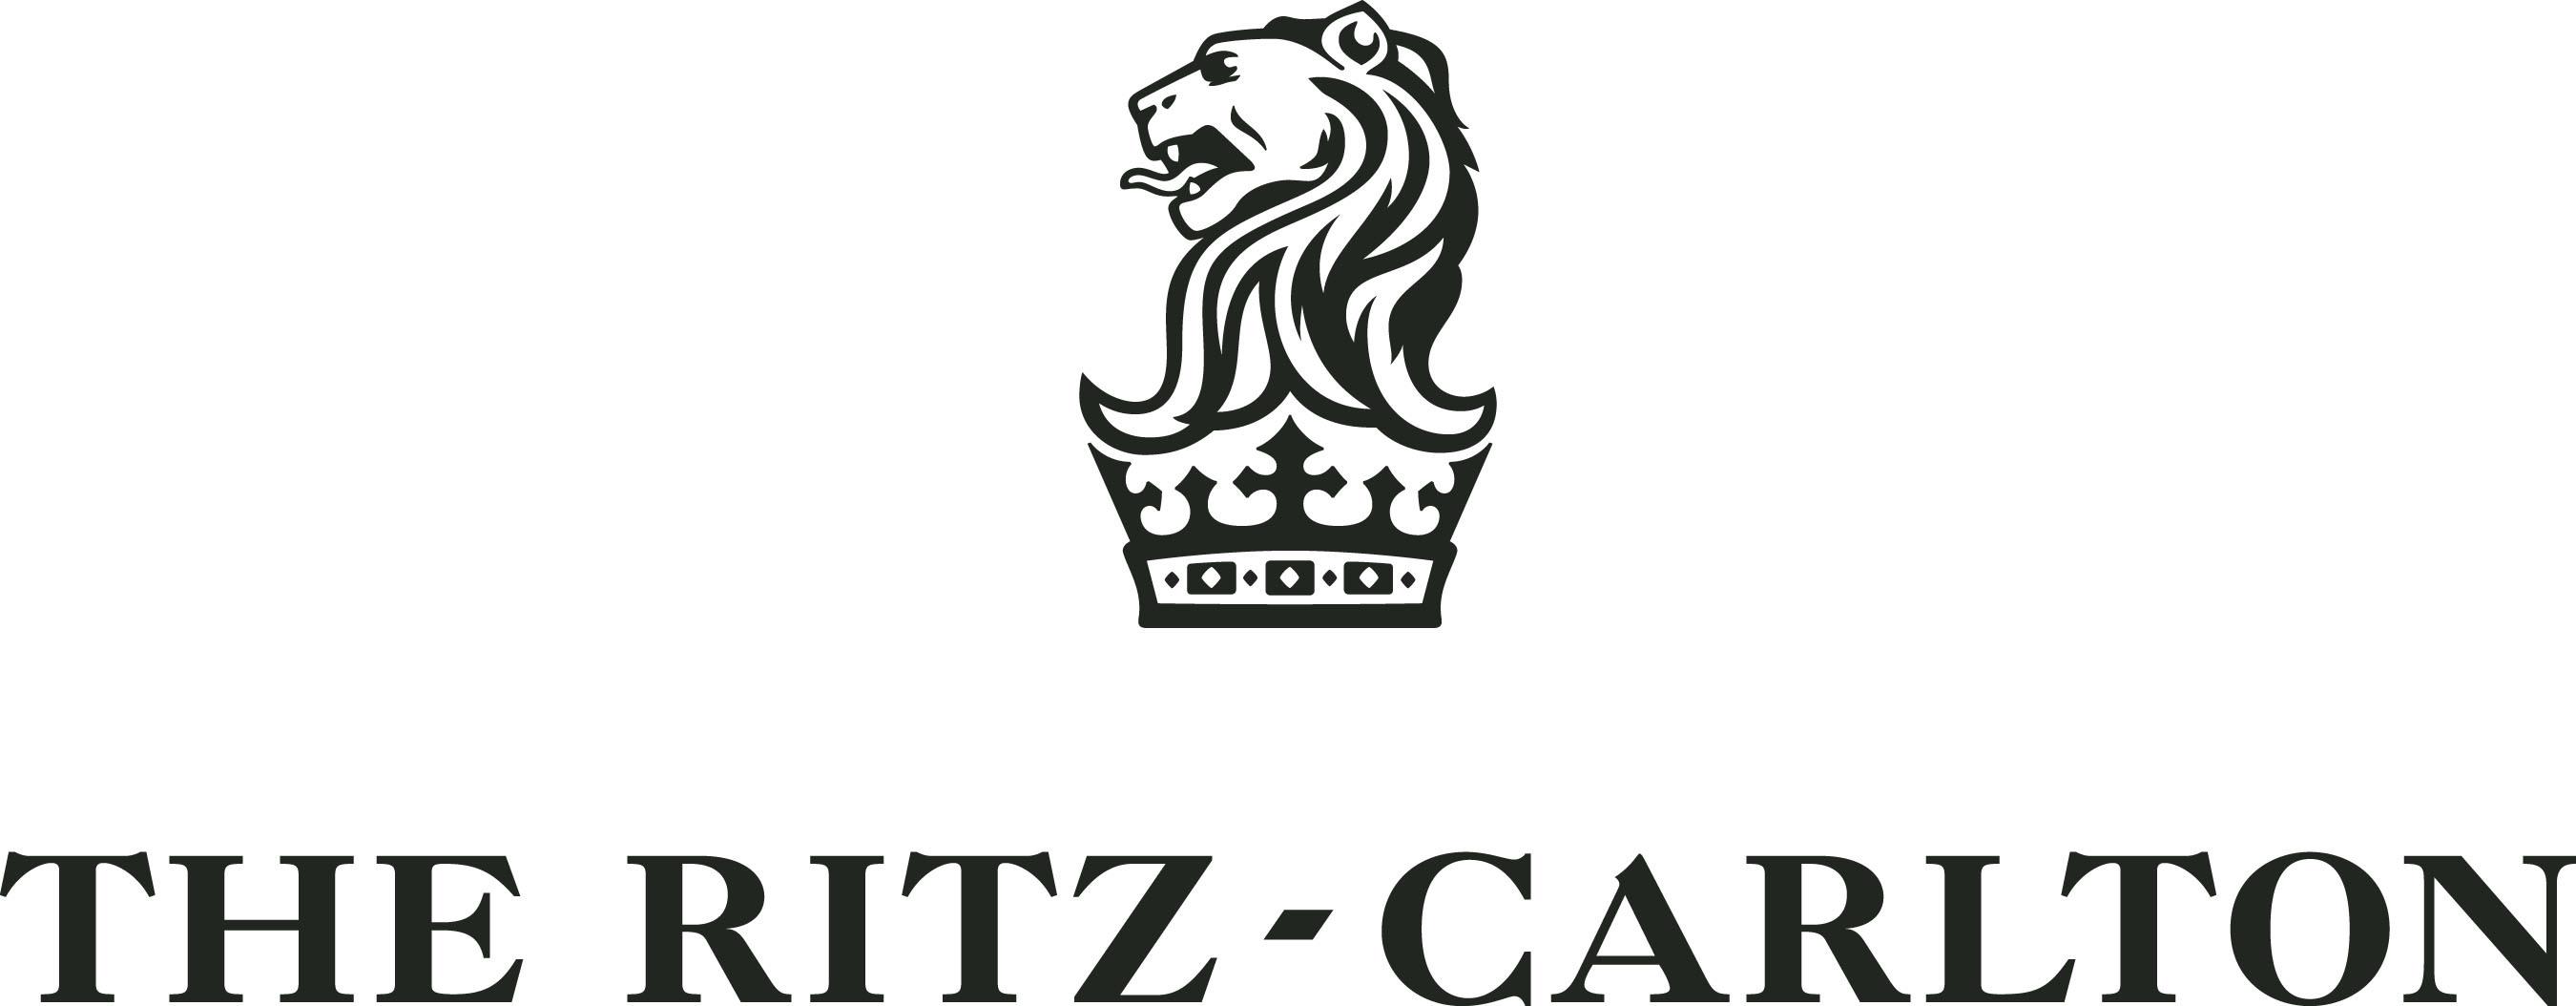 ritz carlton history background